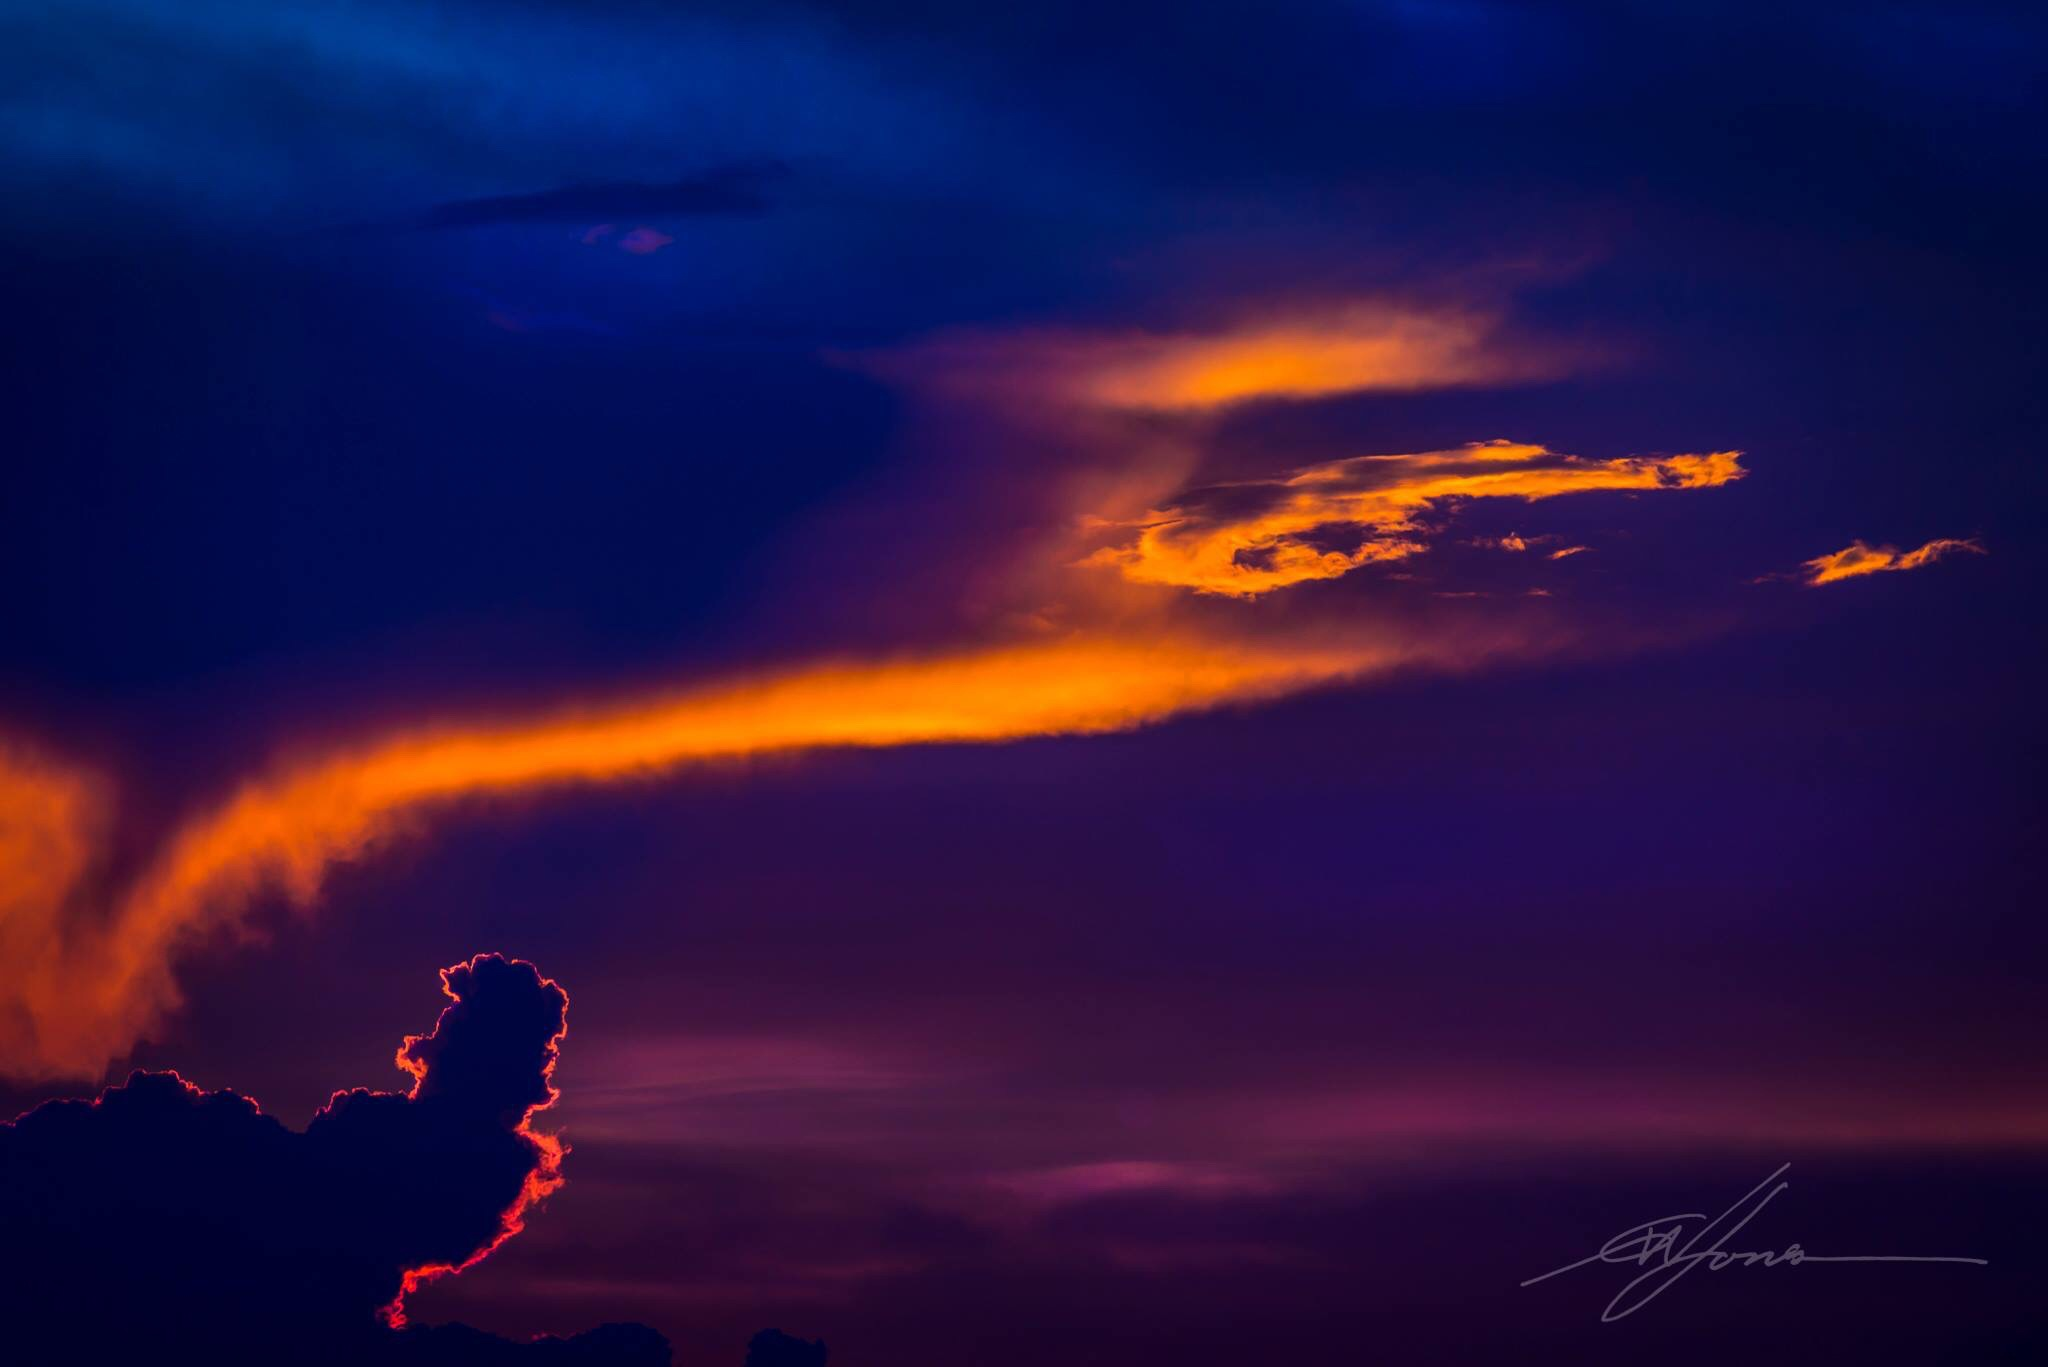 The Heavens Proclaim - 3 by gwjones317